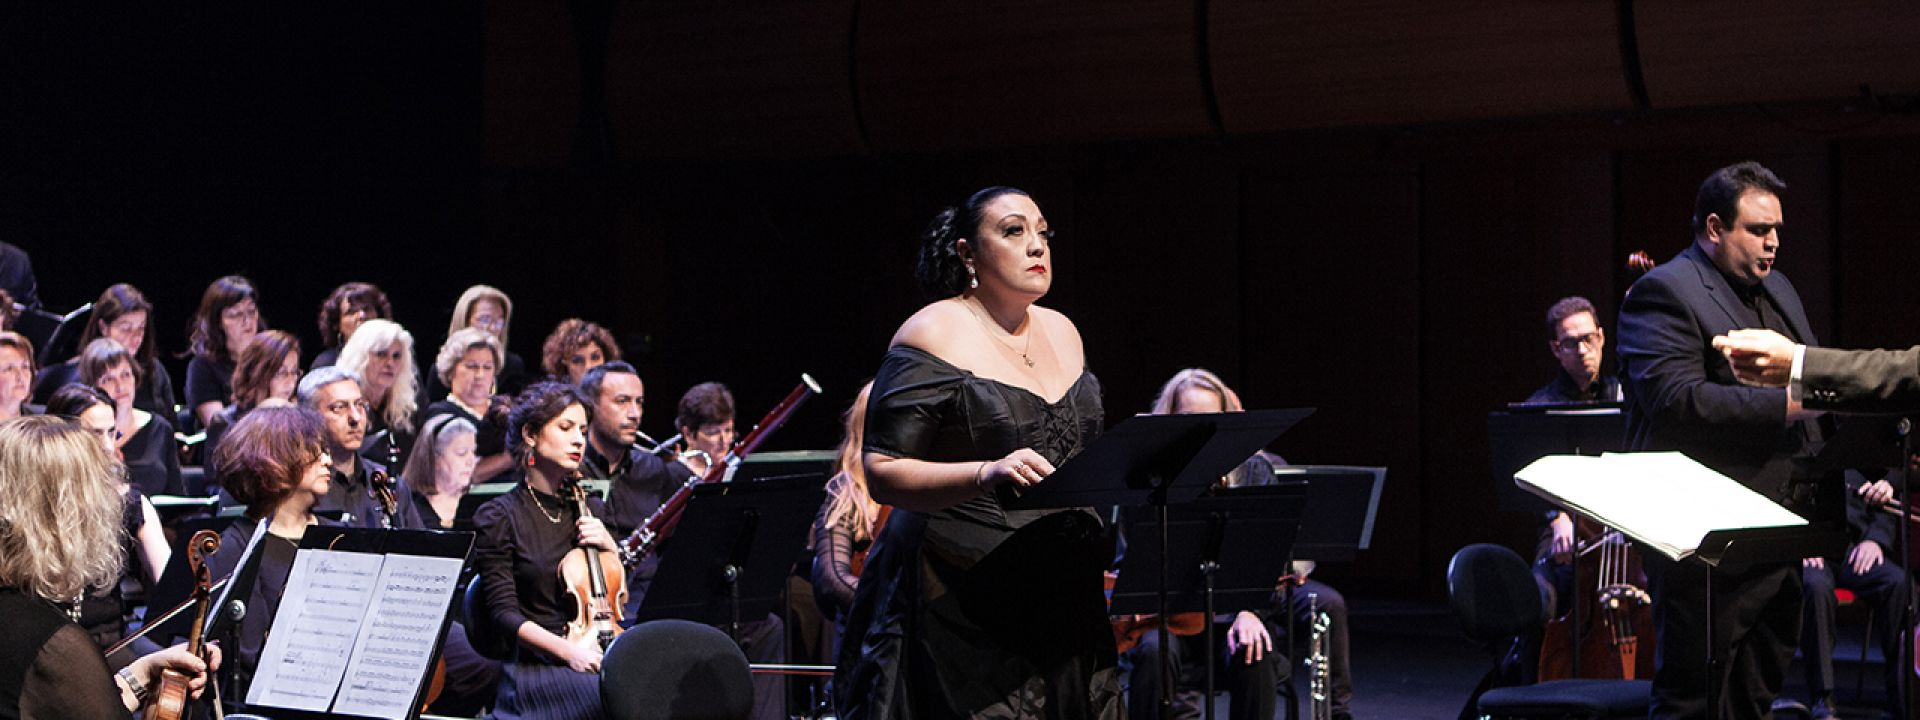 Greek Premiere of the Requiem for the Nazi Victims (oratorio) - Εικόνα